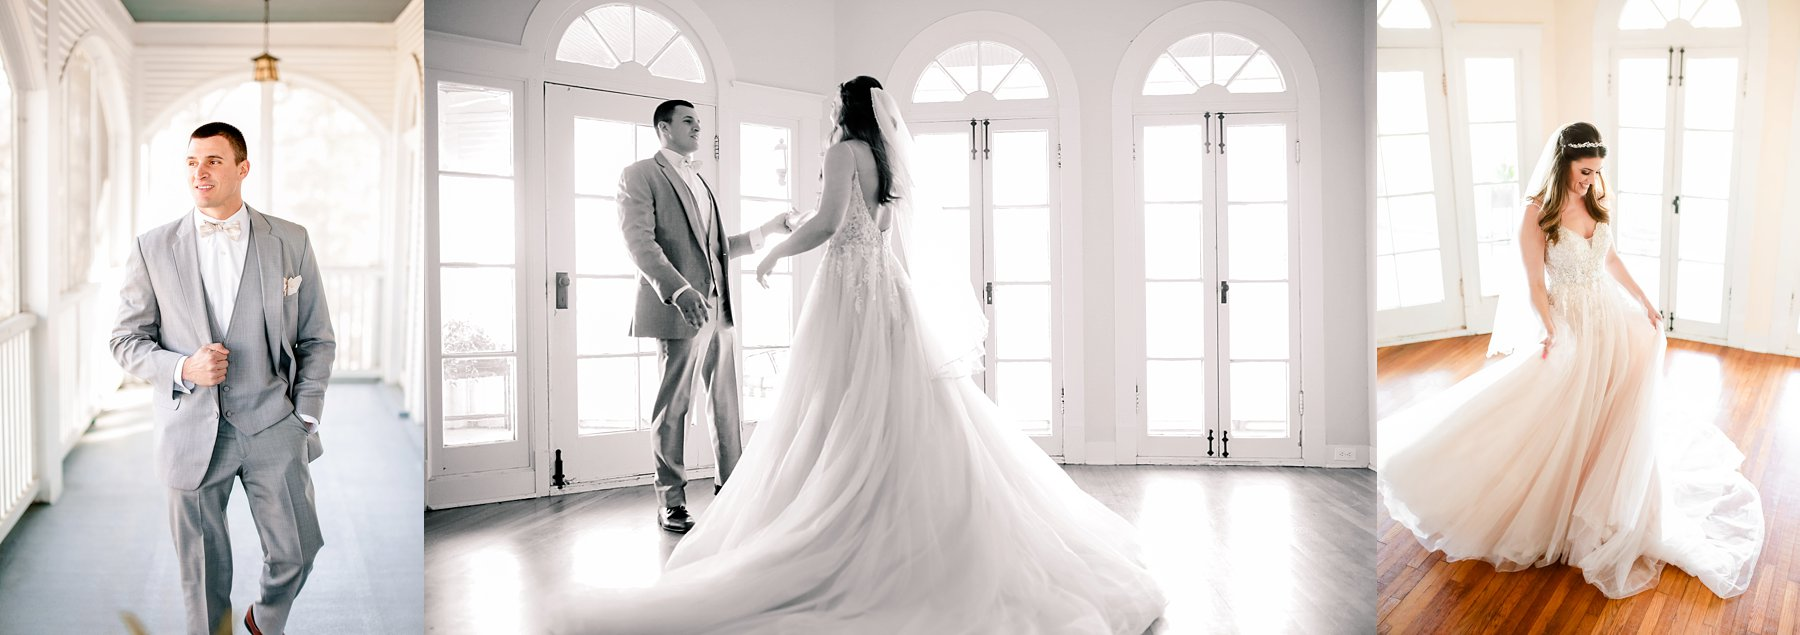 photographer_wedding_saint_louis_Kansas_City_Photography_Videography_workshop_training_styled_engagement_Lake_Ozark_KC_MO_STL_Rolla_Hermann_Saint_James_0443.jpg